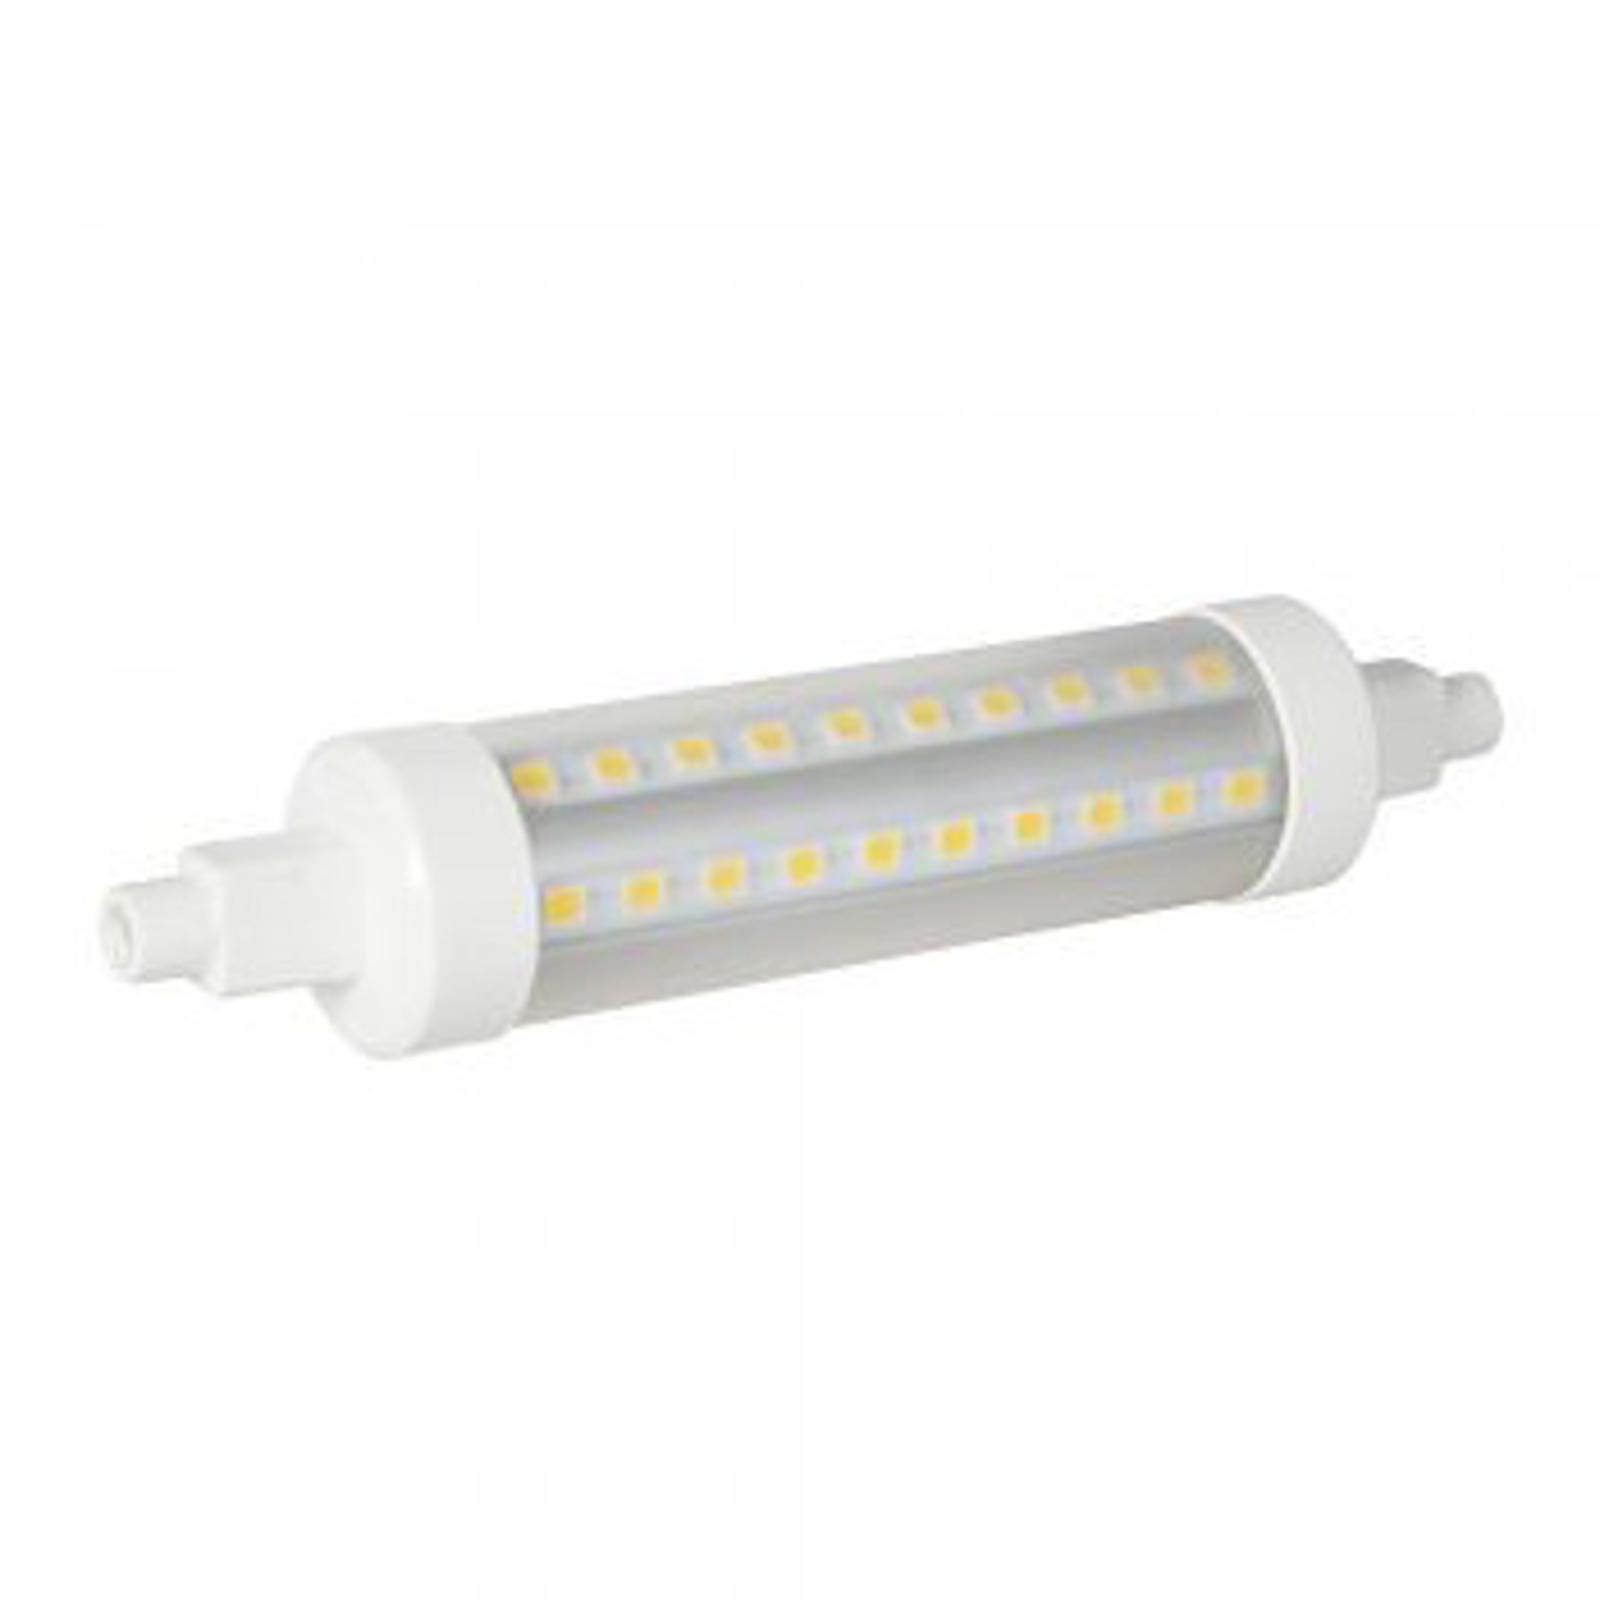 R7s 8 W 827 LED-lampa VEO i stavform